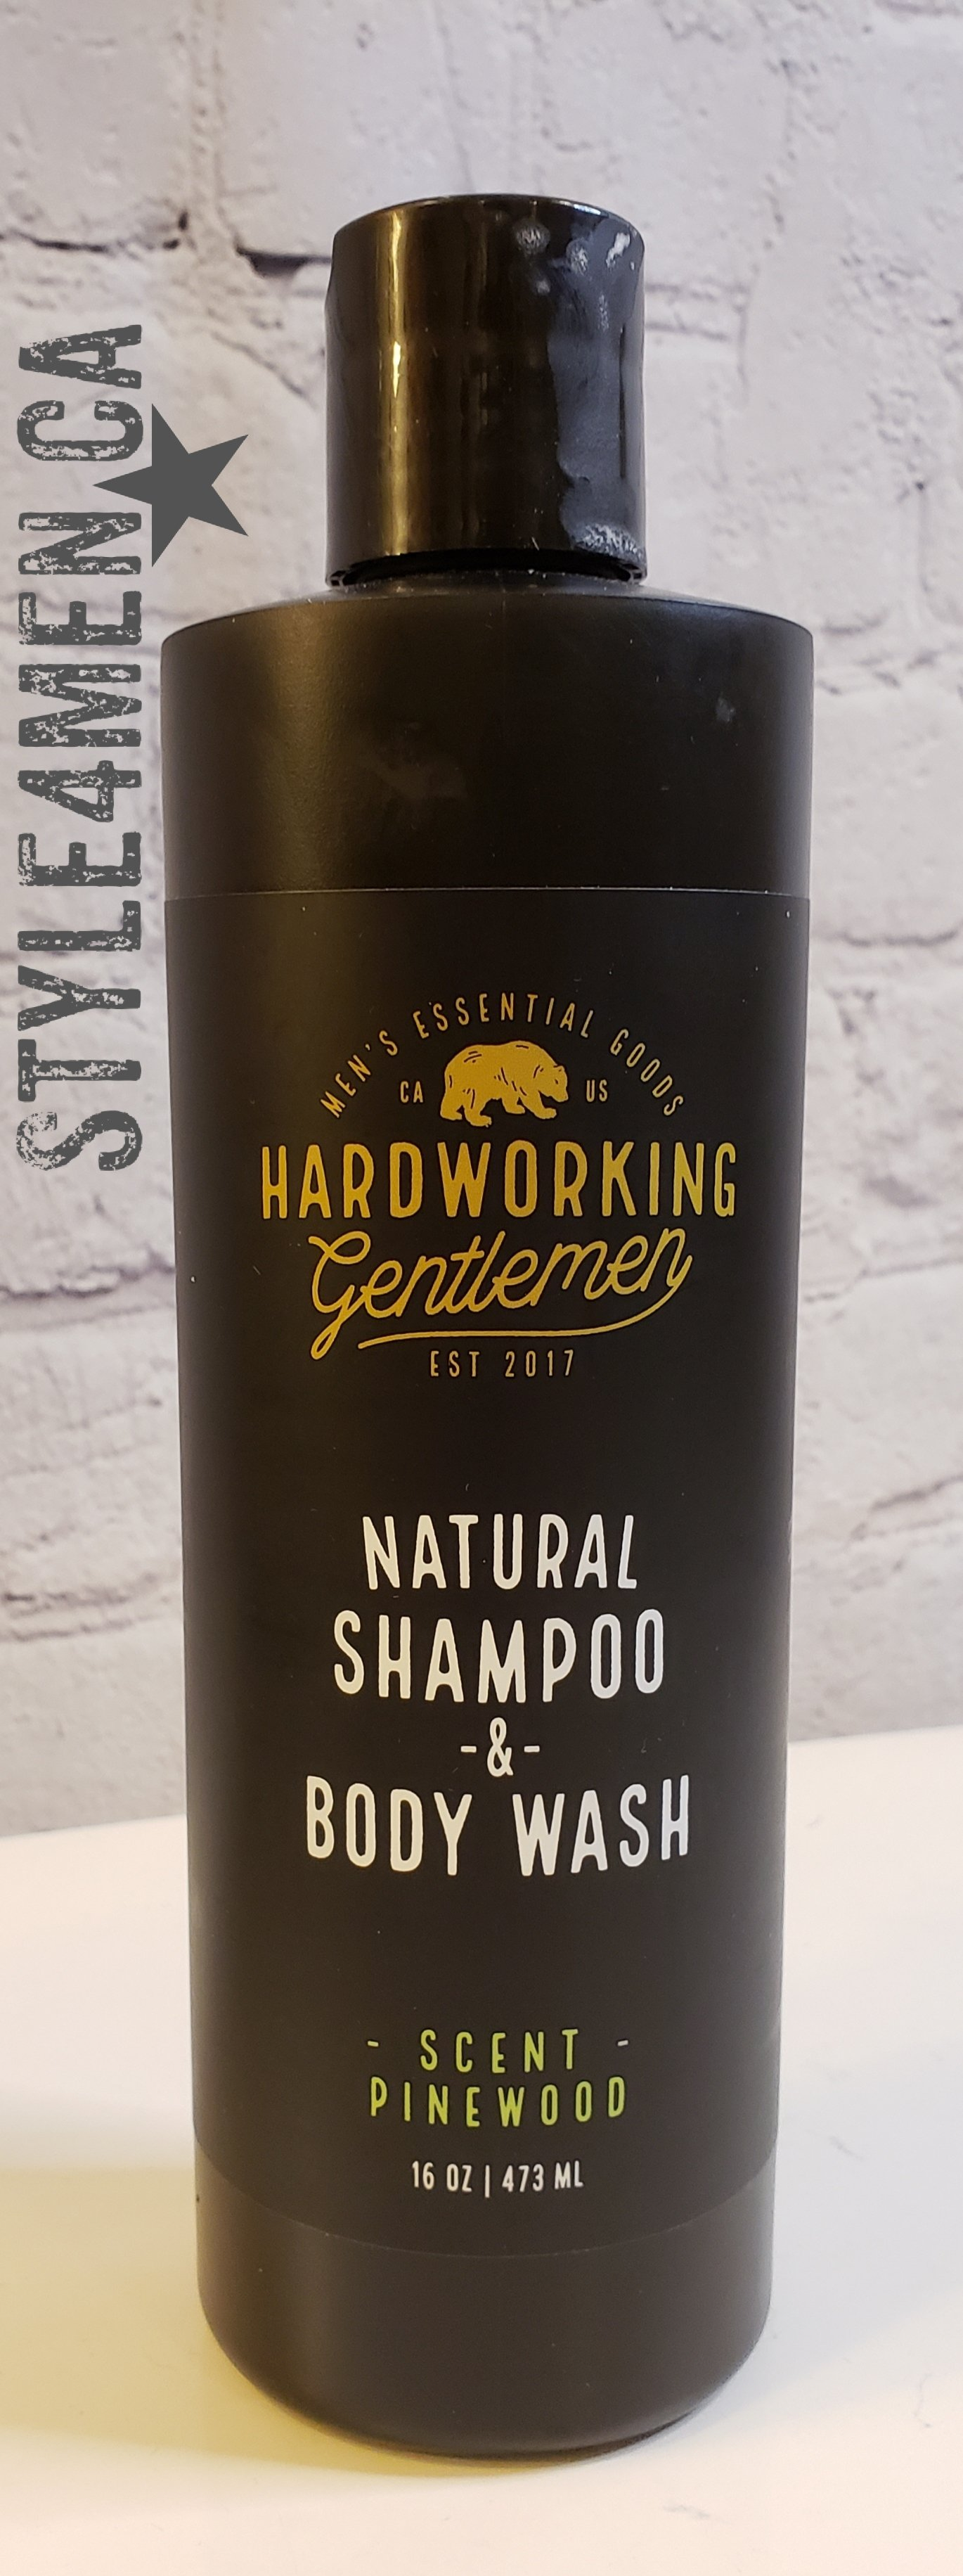 Hardworking Gentlemen Body Wash